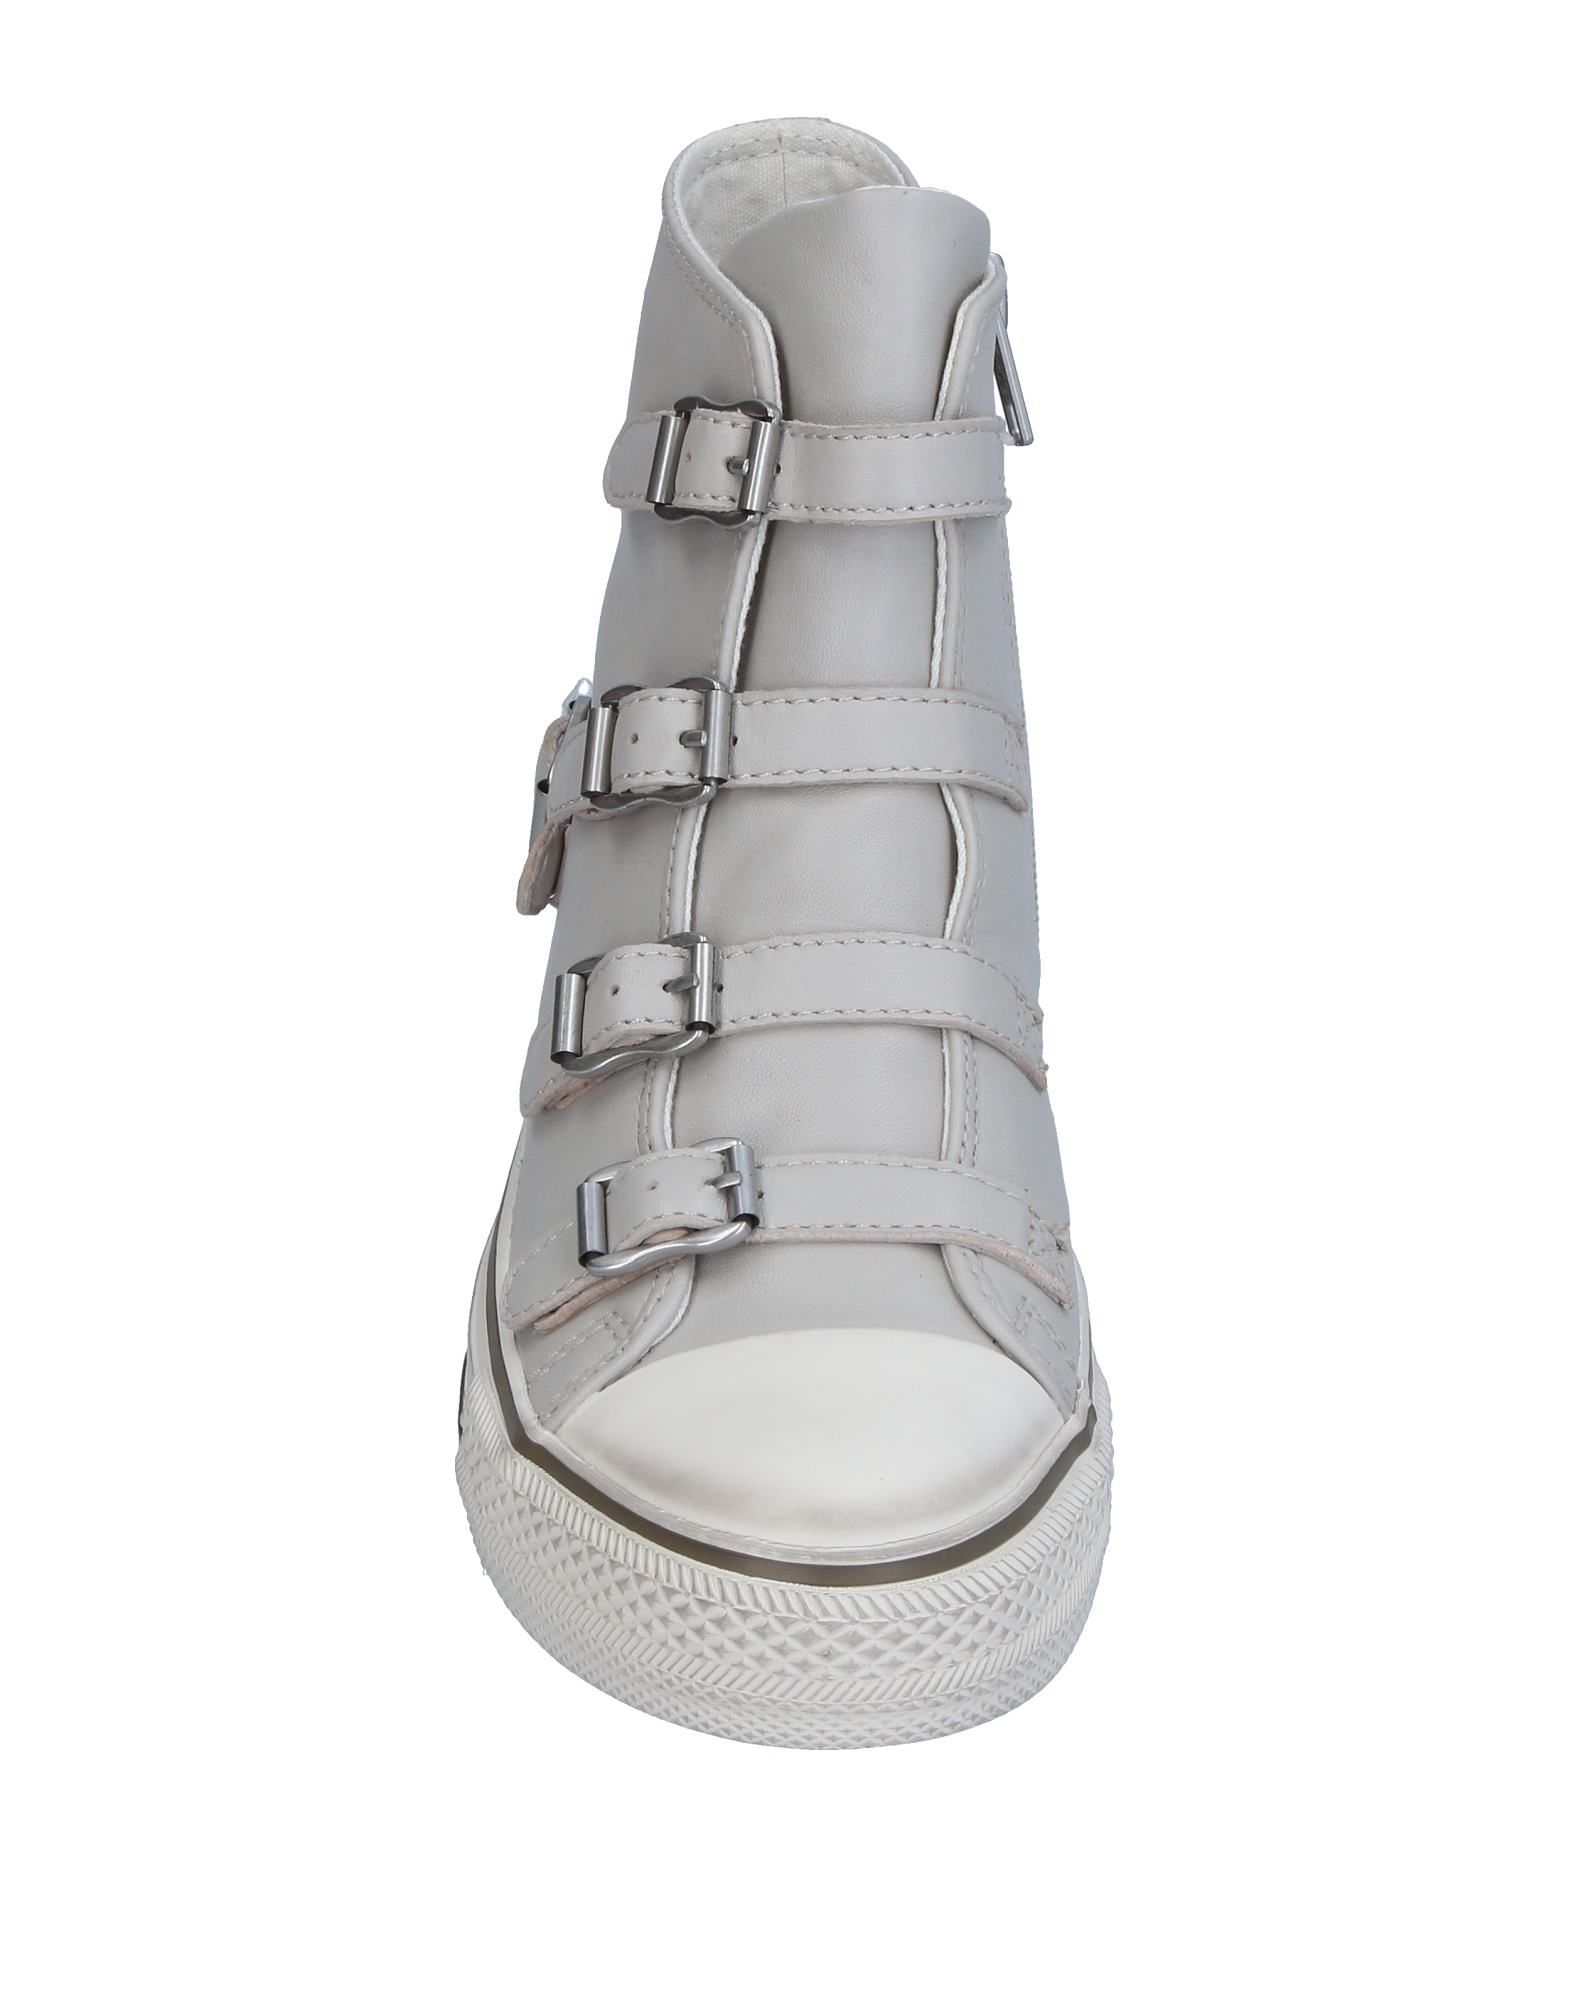 Ash Sneakers Damen  11295534XC 11295534XC 11295534XC Gute Qualität beliebte Schuhe 5de019